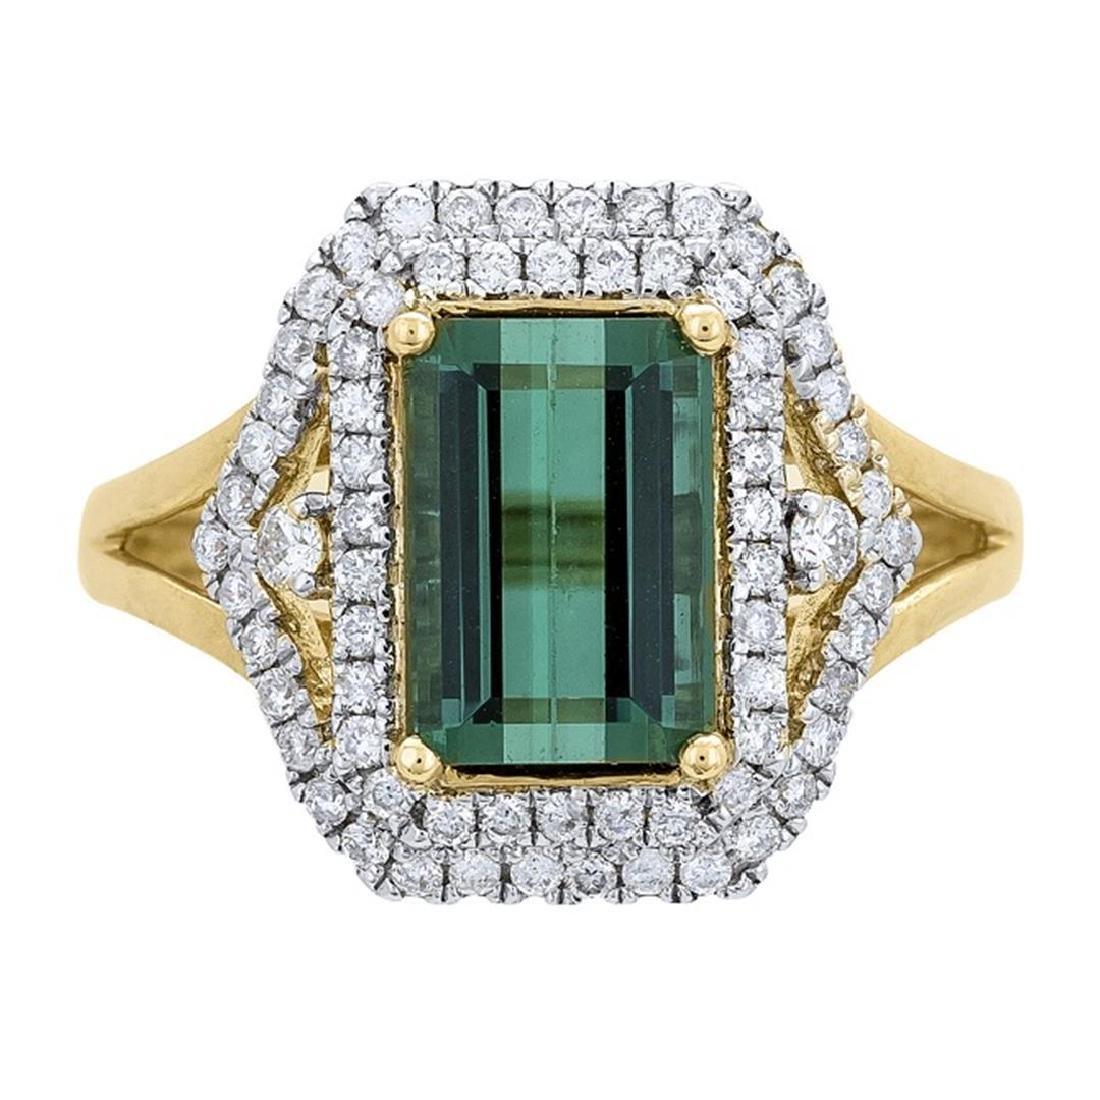 2.99 ctw Tourmaline and Diamond Ring - 14KT Yellow Gold